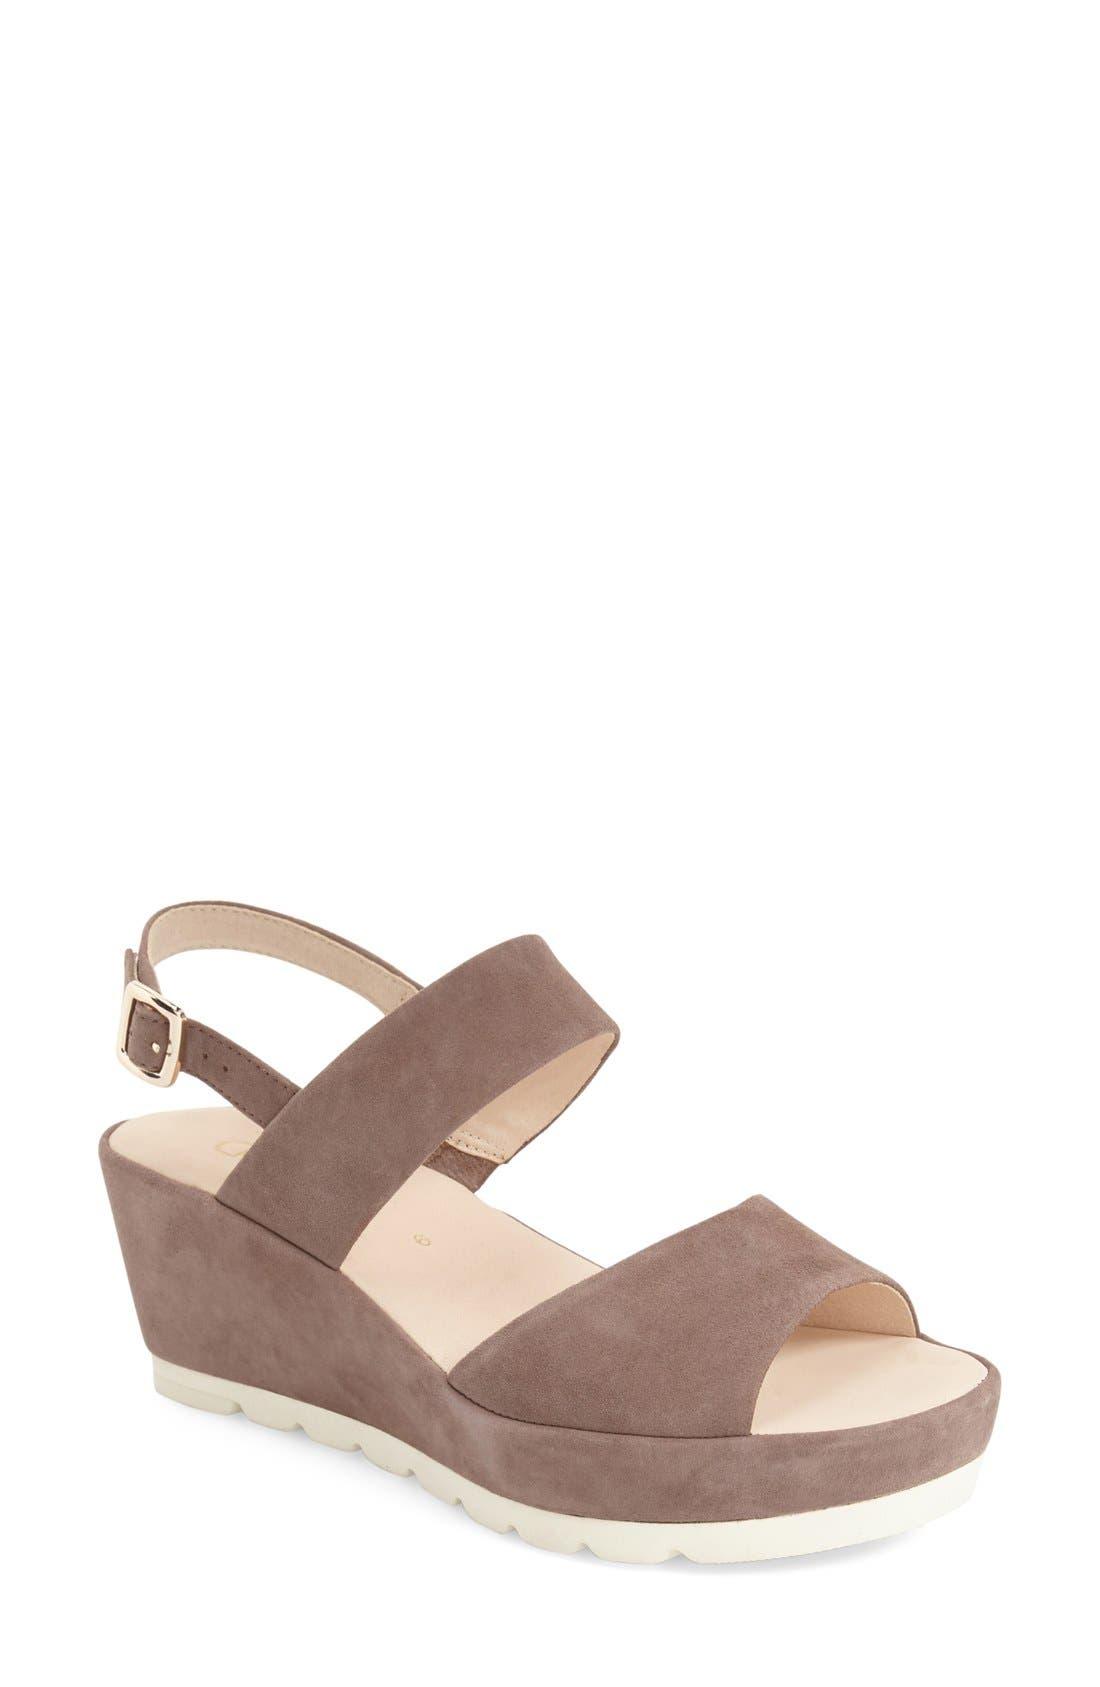 Two-Strap Sandal,                             Main thumbnail 2, color,